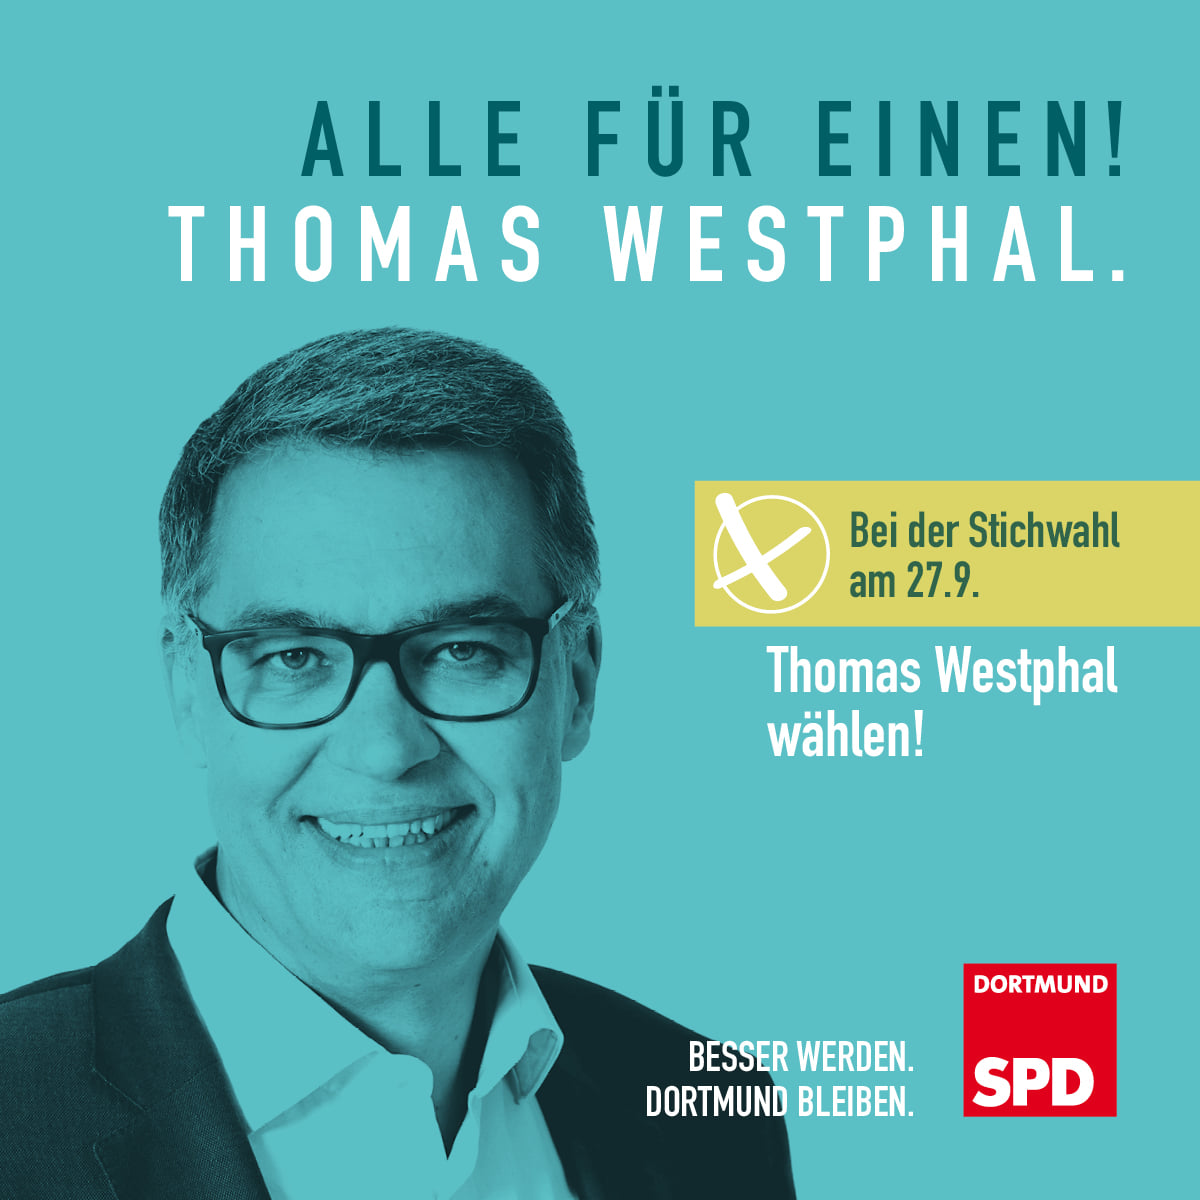 Thomas Westphal